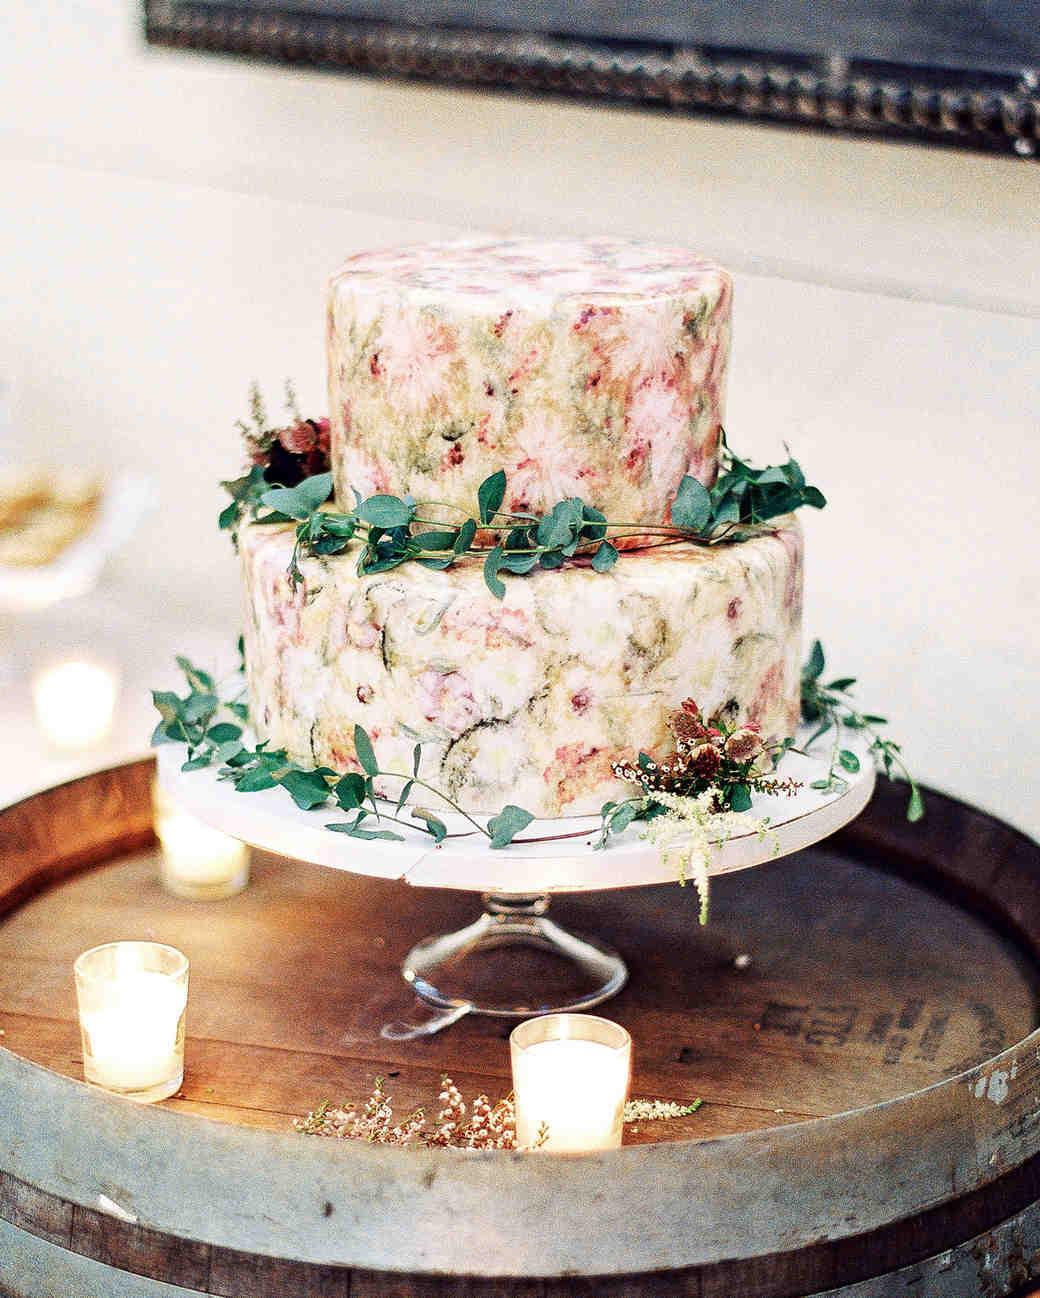 Diamond monroe and victoria cakes-10888